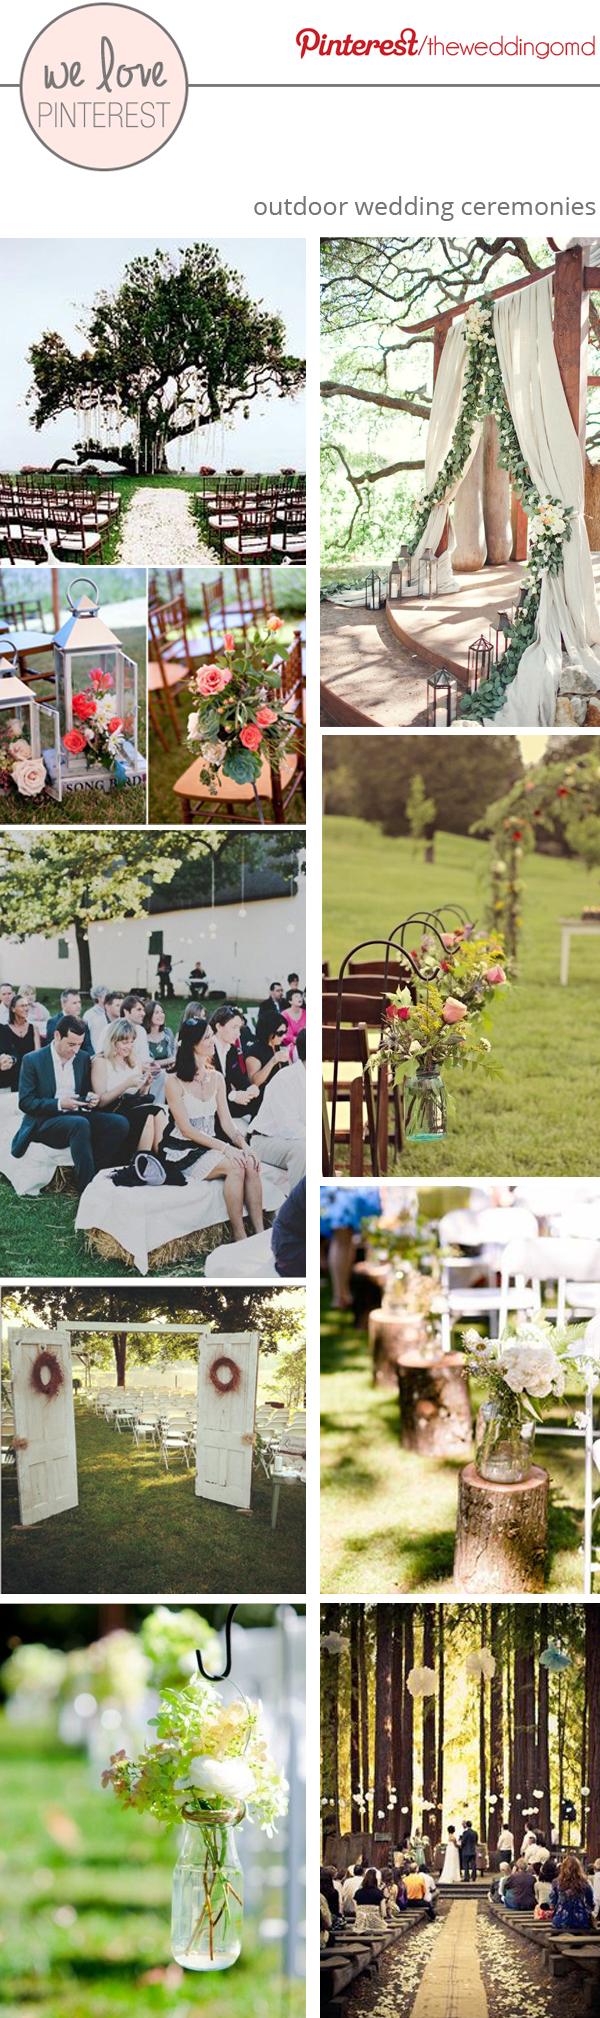 outdoor wedding ceremony ideas for summer